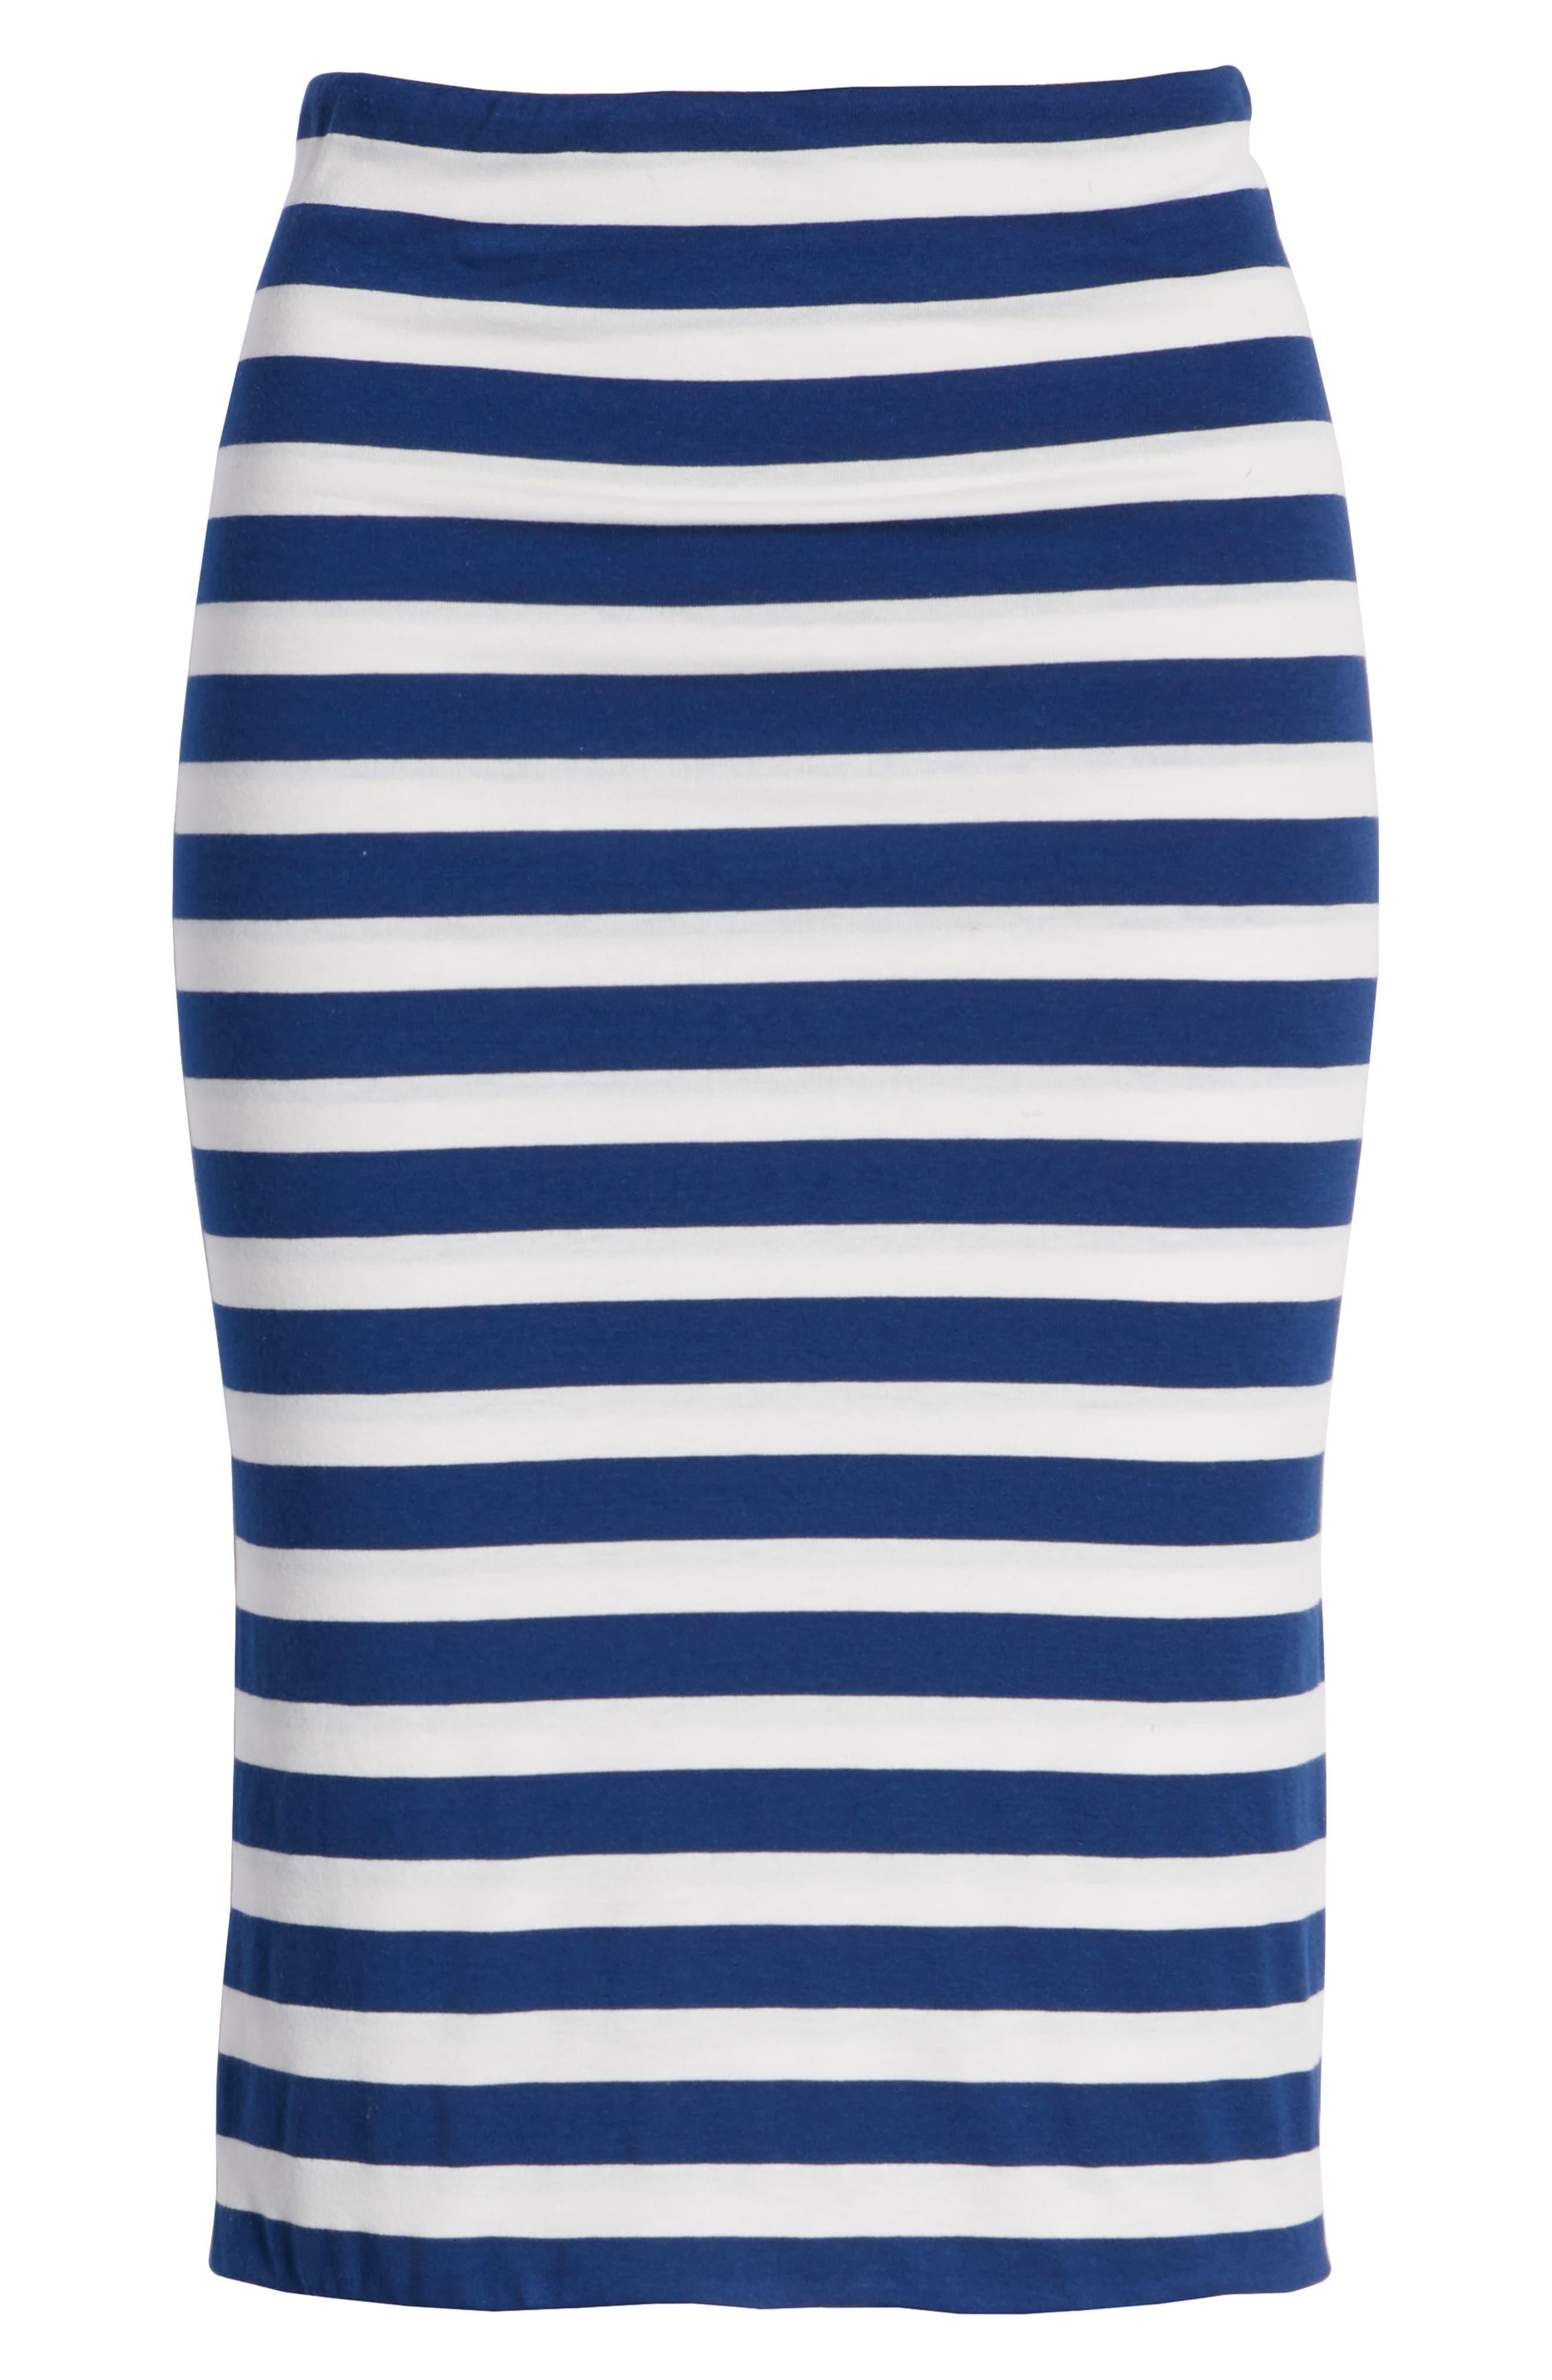 x Hi Sugarplum! Fornillo Pencil Skirt,                             Alternate thumbnail 7, color,                             Blue Stripe